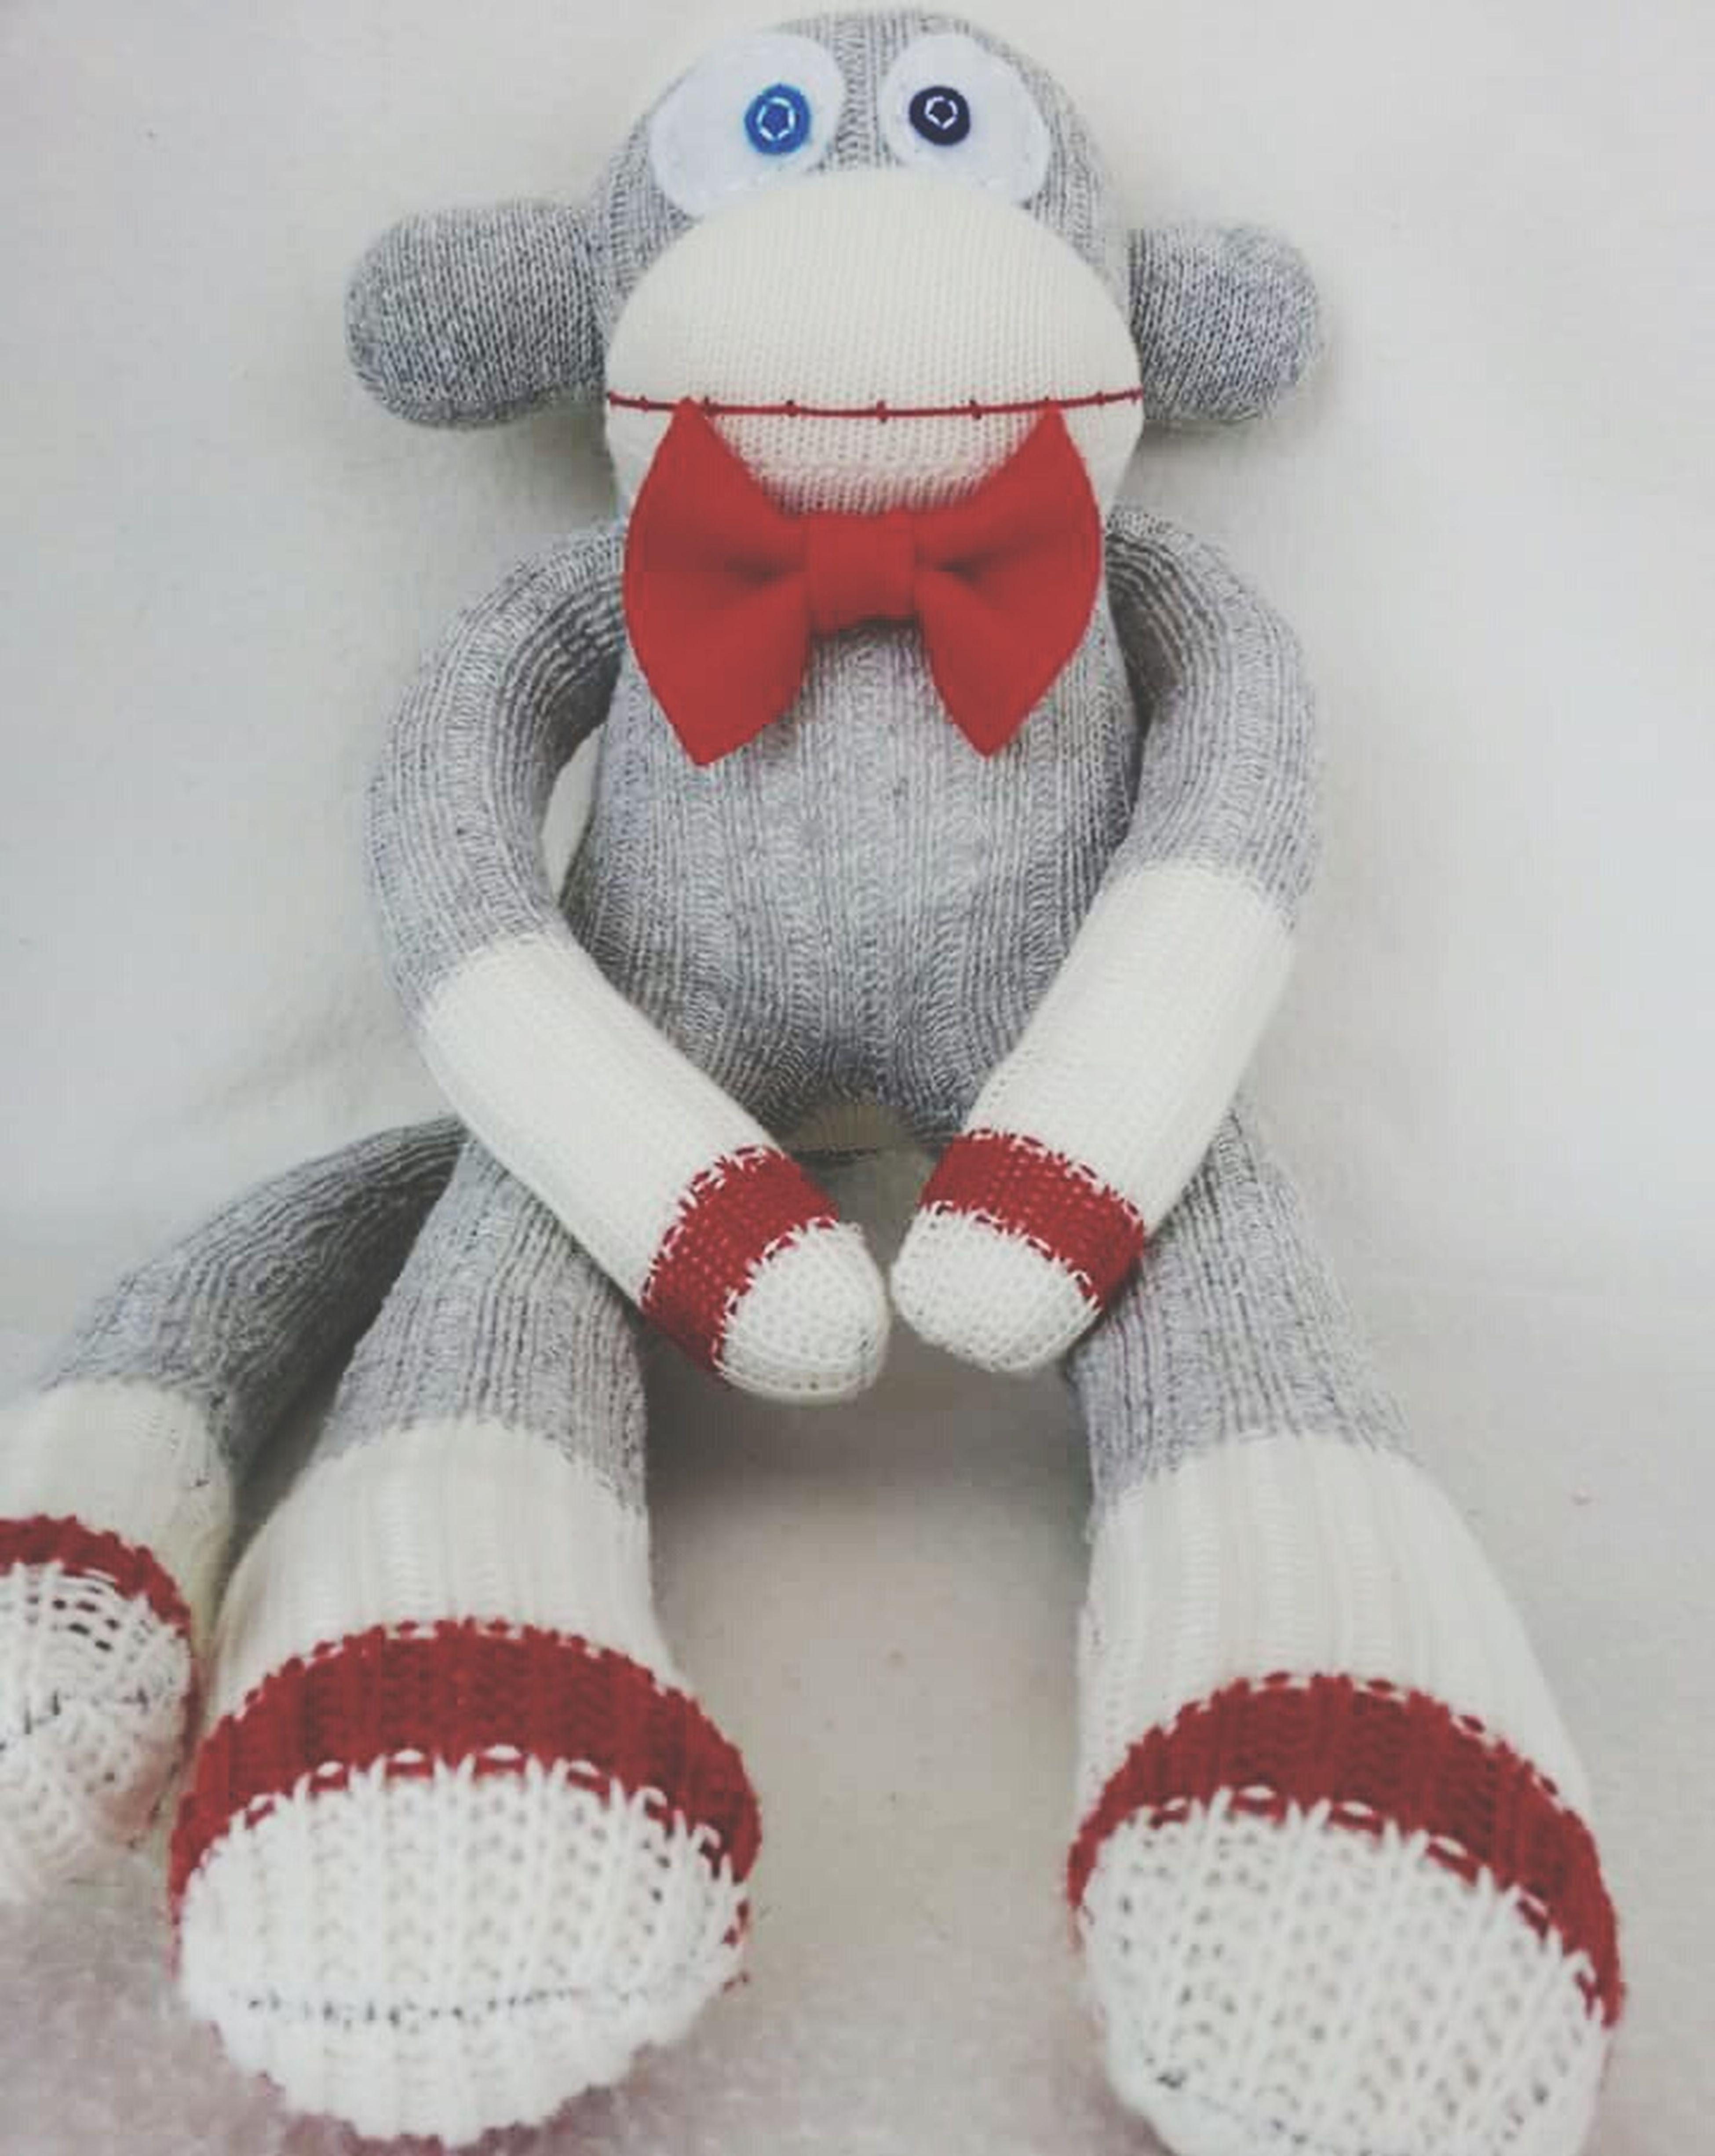 My sockmonkey skittles Sockmonkey His Name Is Skittles Blue Eye Brown Eye Monkey Love Red Bow Tie Perfect Gentleman Handmade